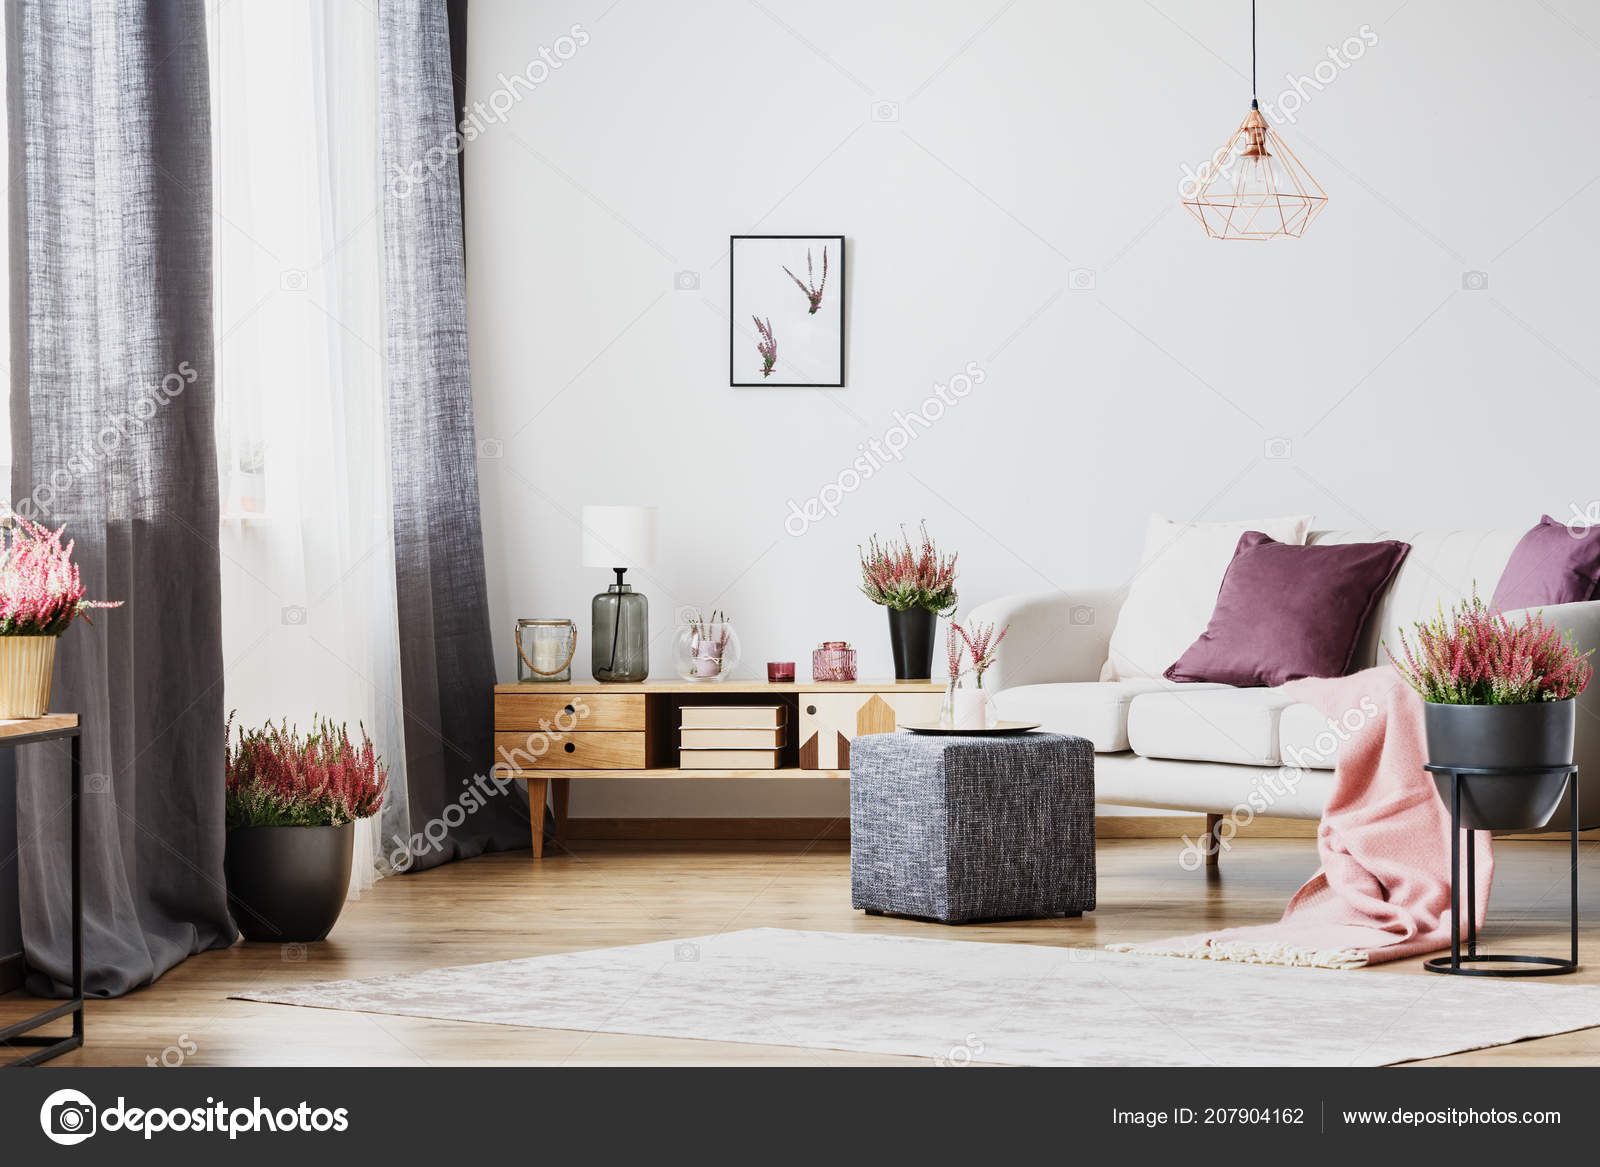 Witte Kast Woonkamer : Houten kast witte bank het interieur van een woonkamer met